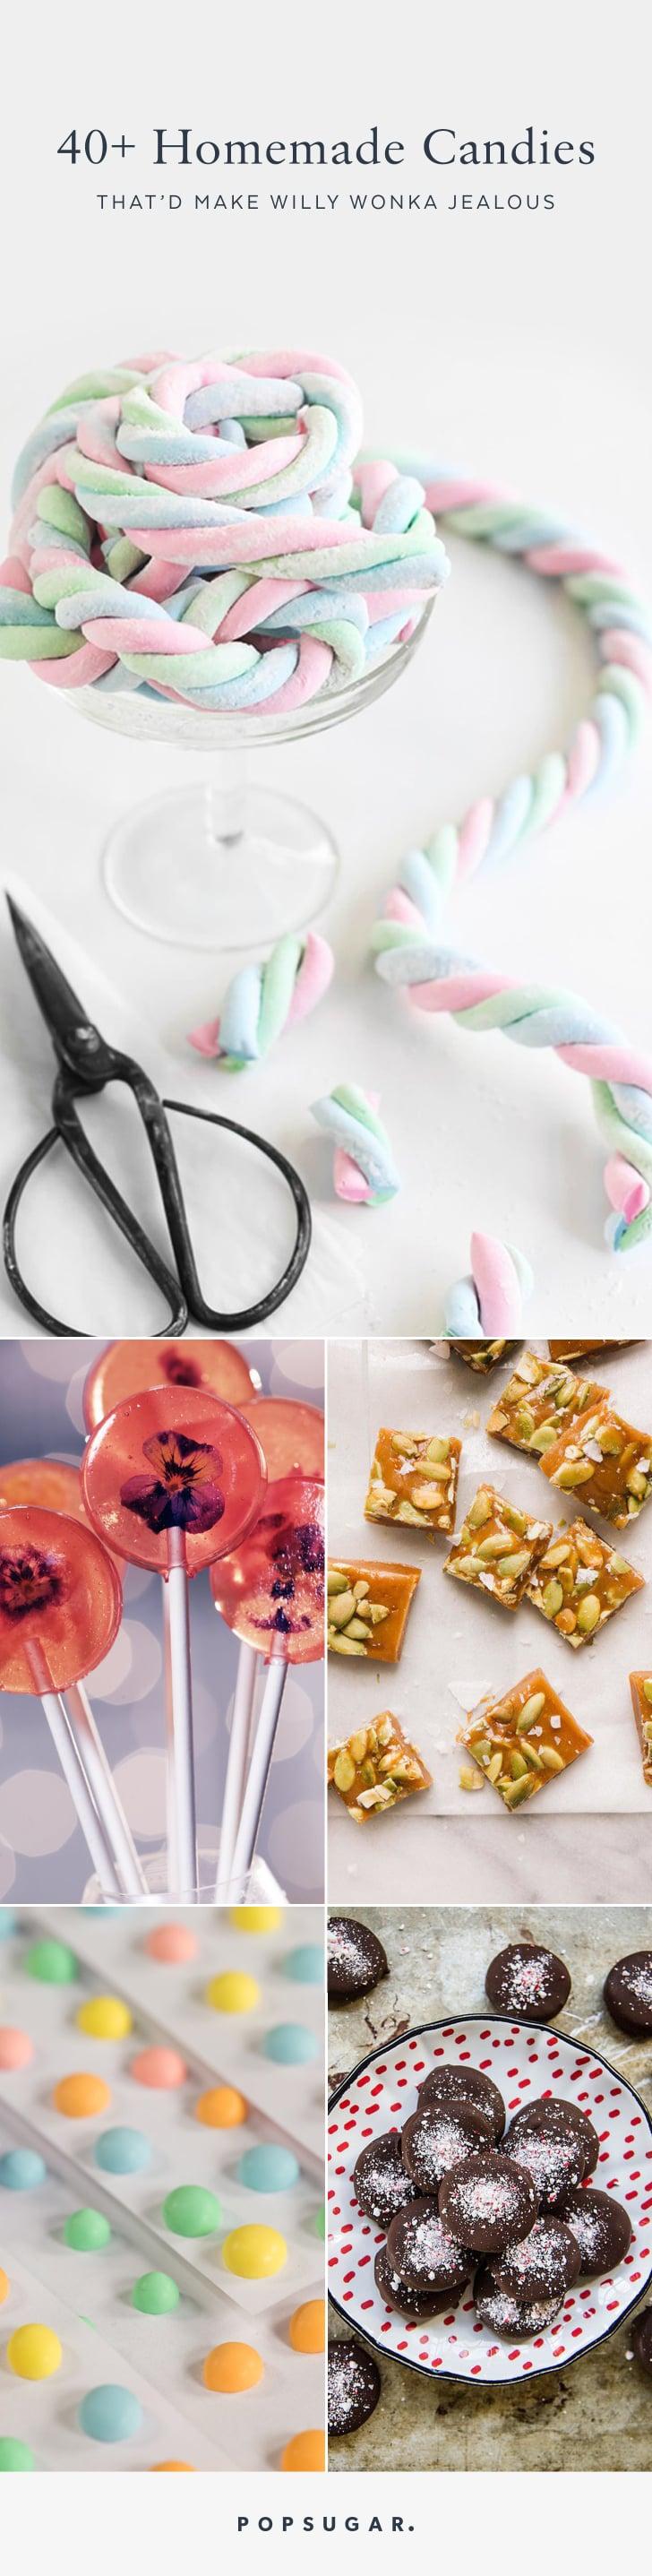 Homemade Candy Recipes